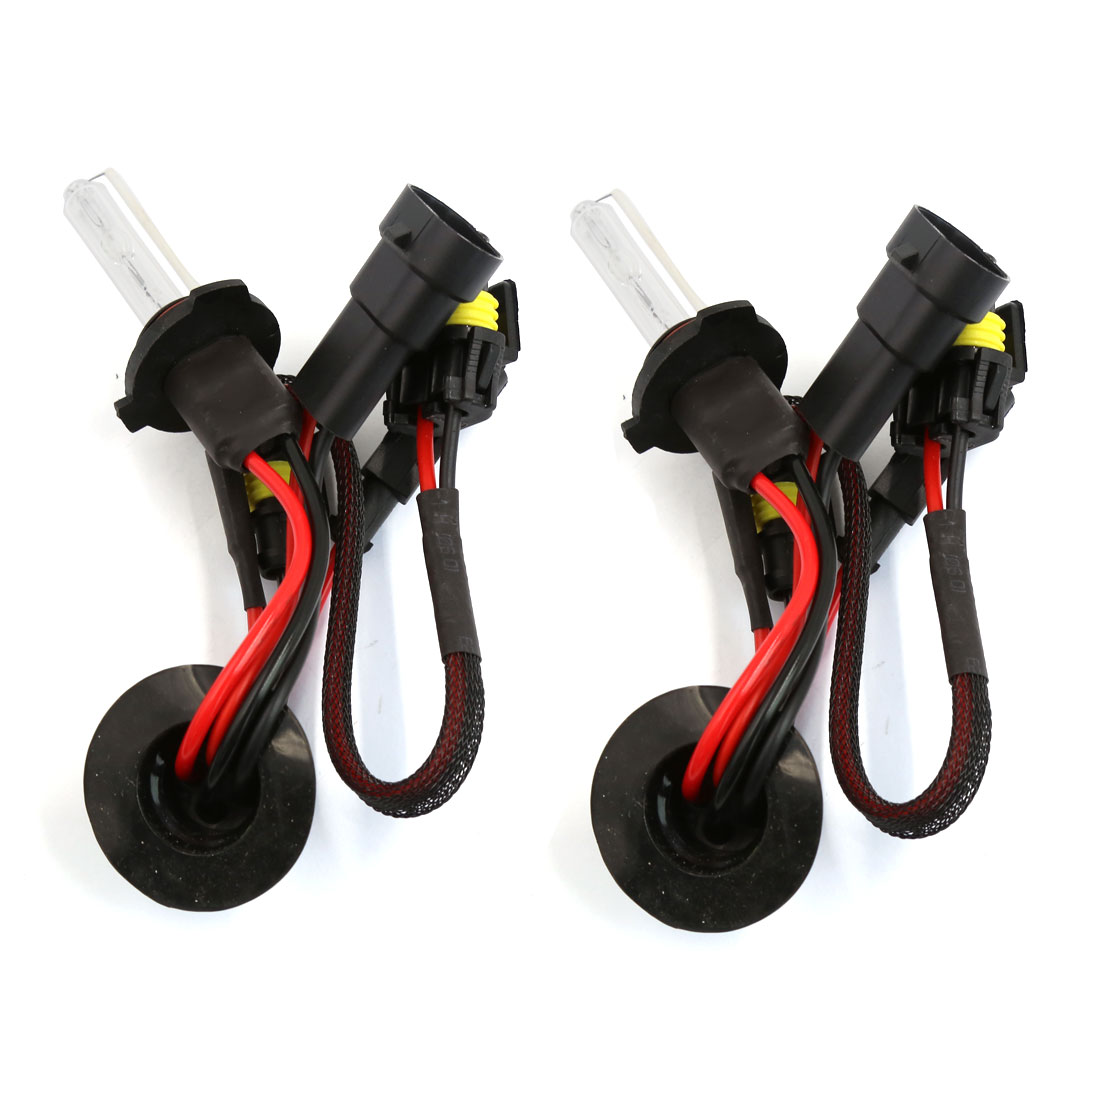 9005 HB3 Socket Xenon Gas HID Replacement Light Bulbs Headlight 6000K 2 Pcs